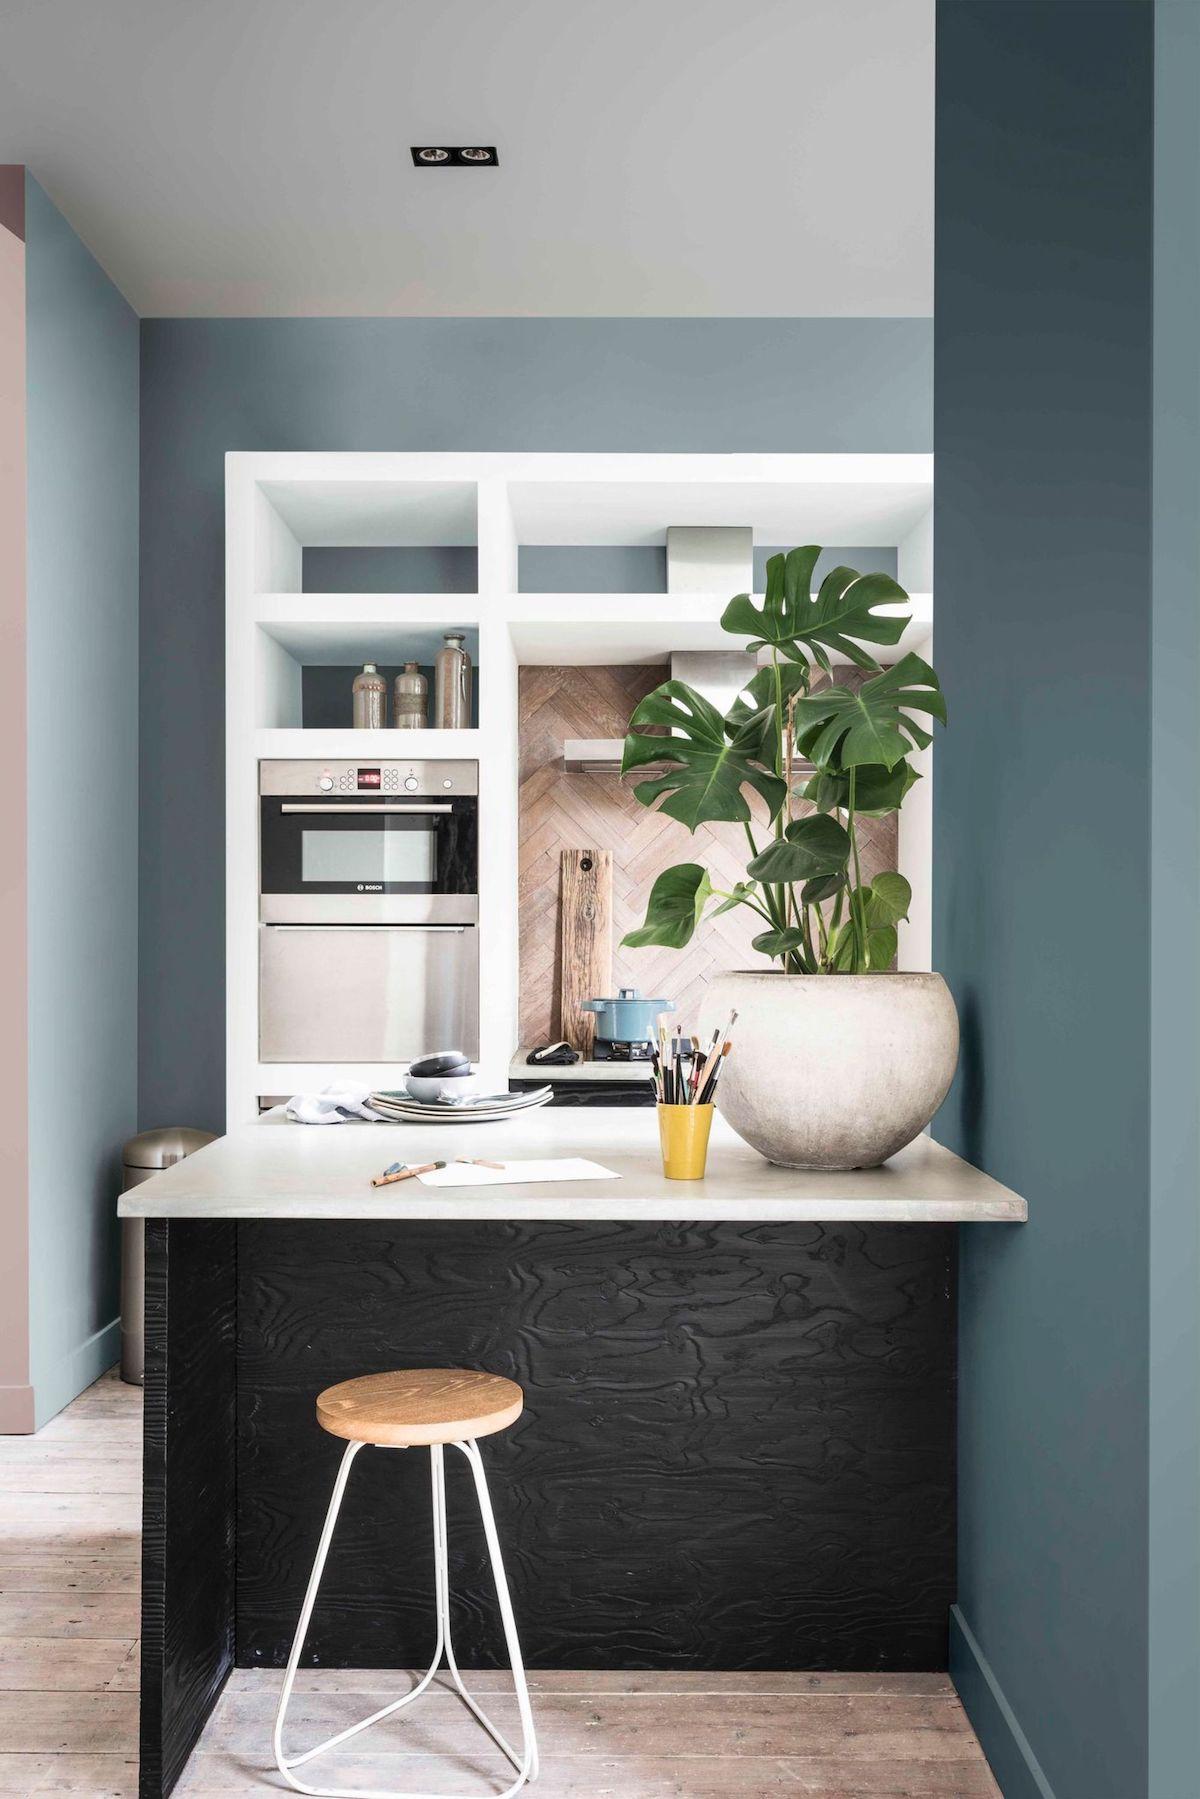 cuisine bleue peinture murale - blog déco - clem around the corner